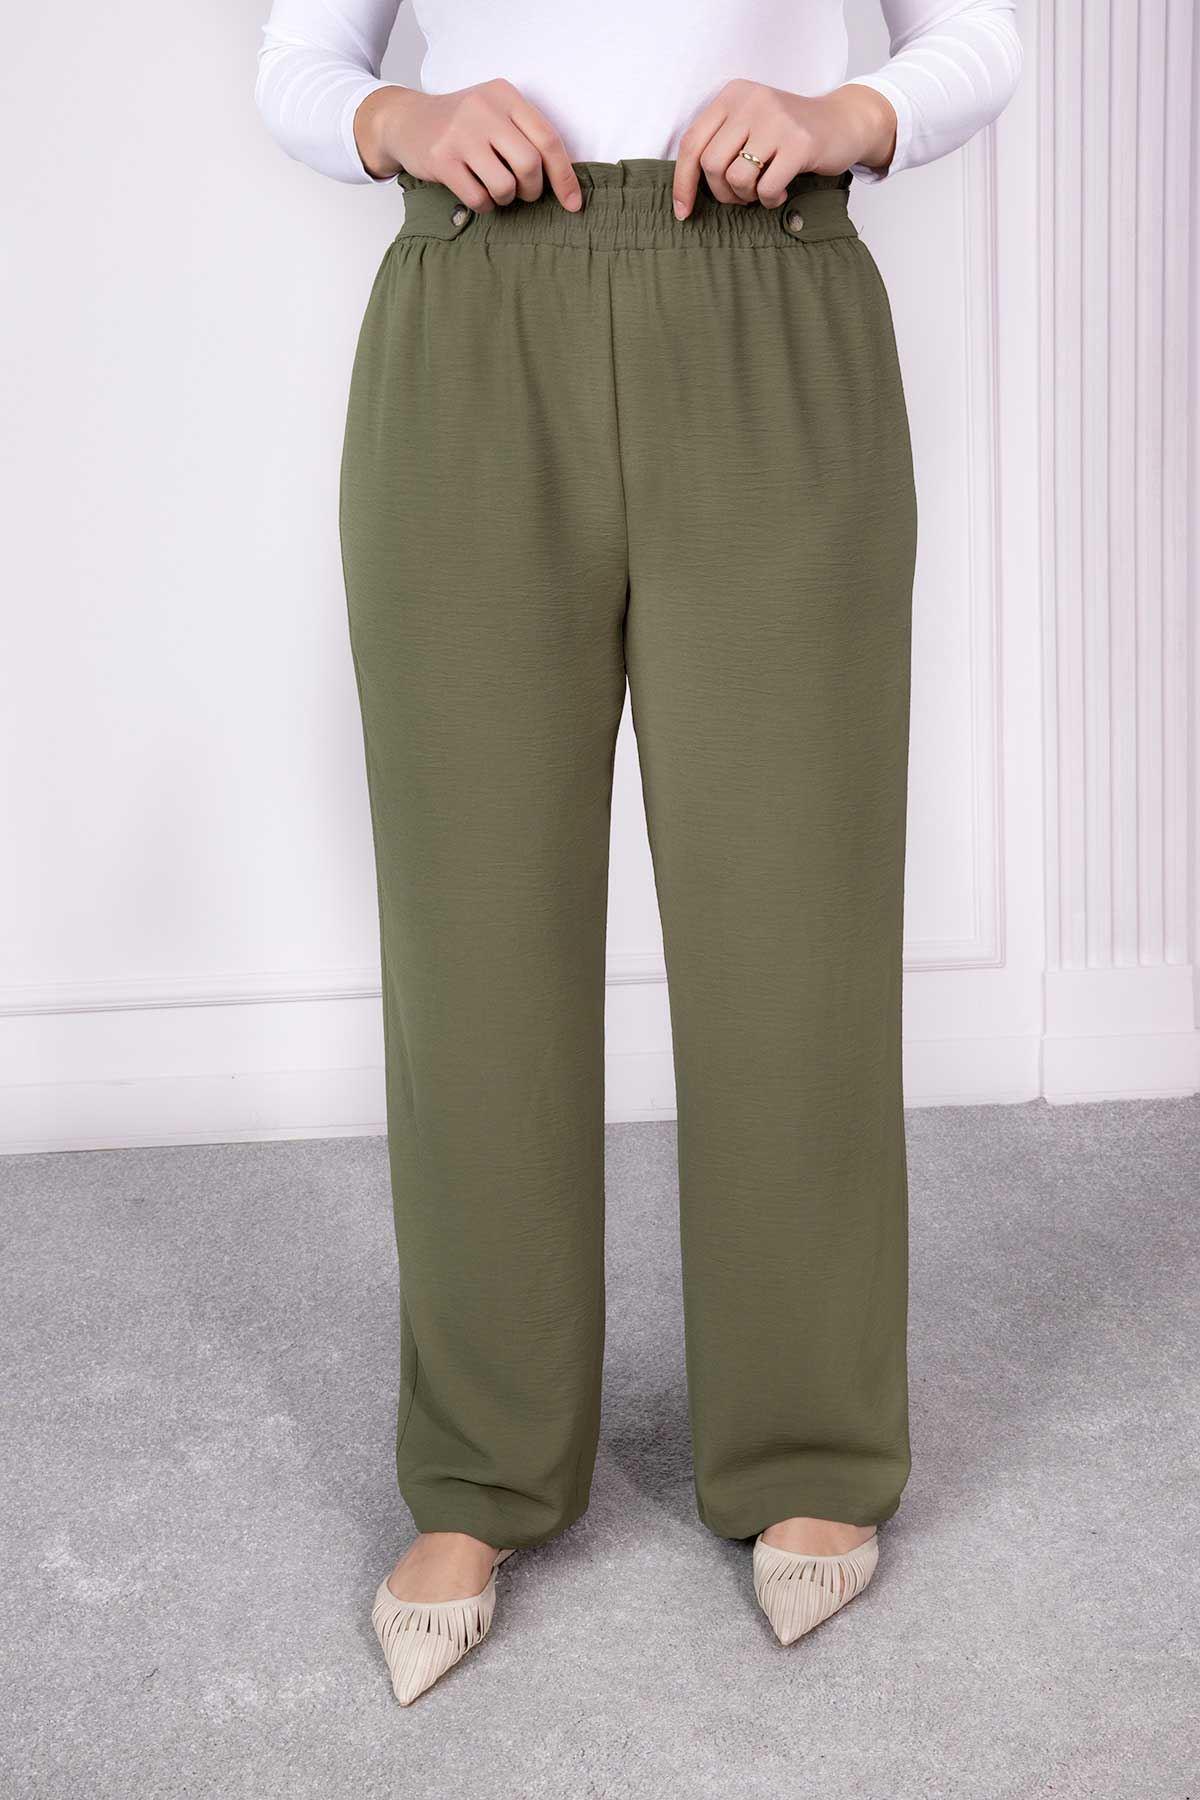 Düğme Detaylı Bol Paça Pantolon Haki 1232-34